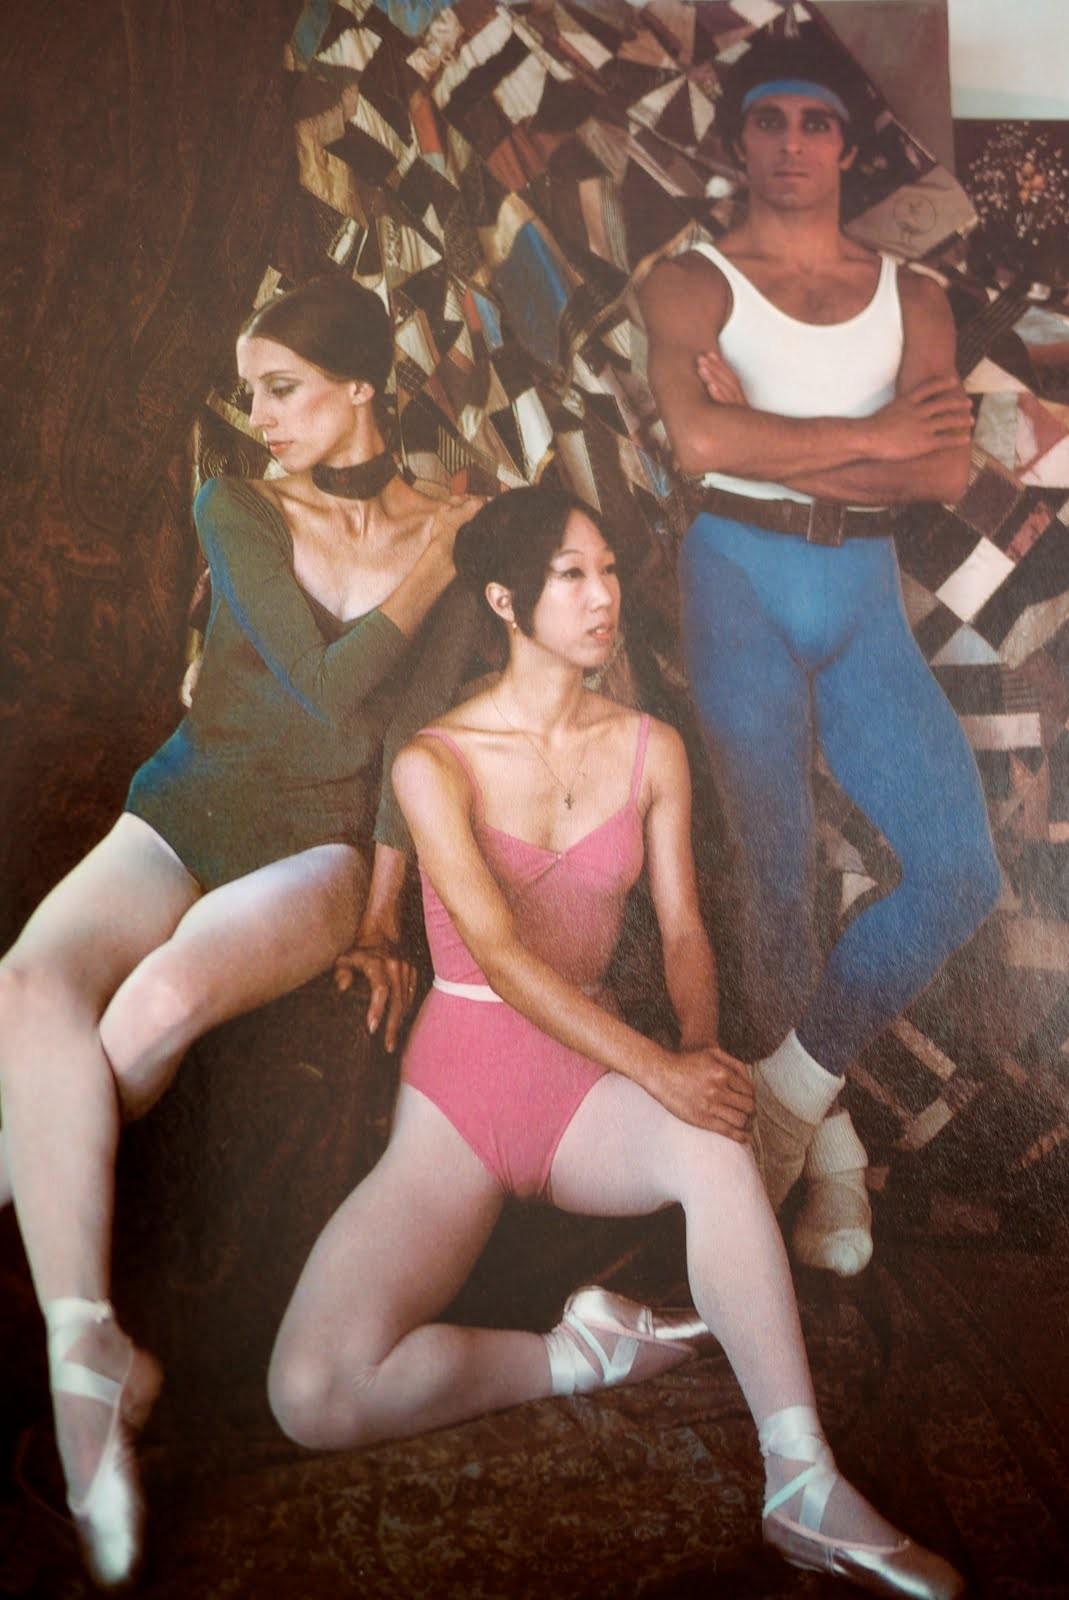 Стефани, Элейн и Тони, 1976 год. Фотограф Мари Косиндас